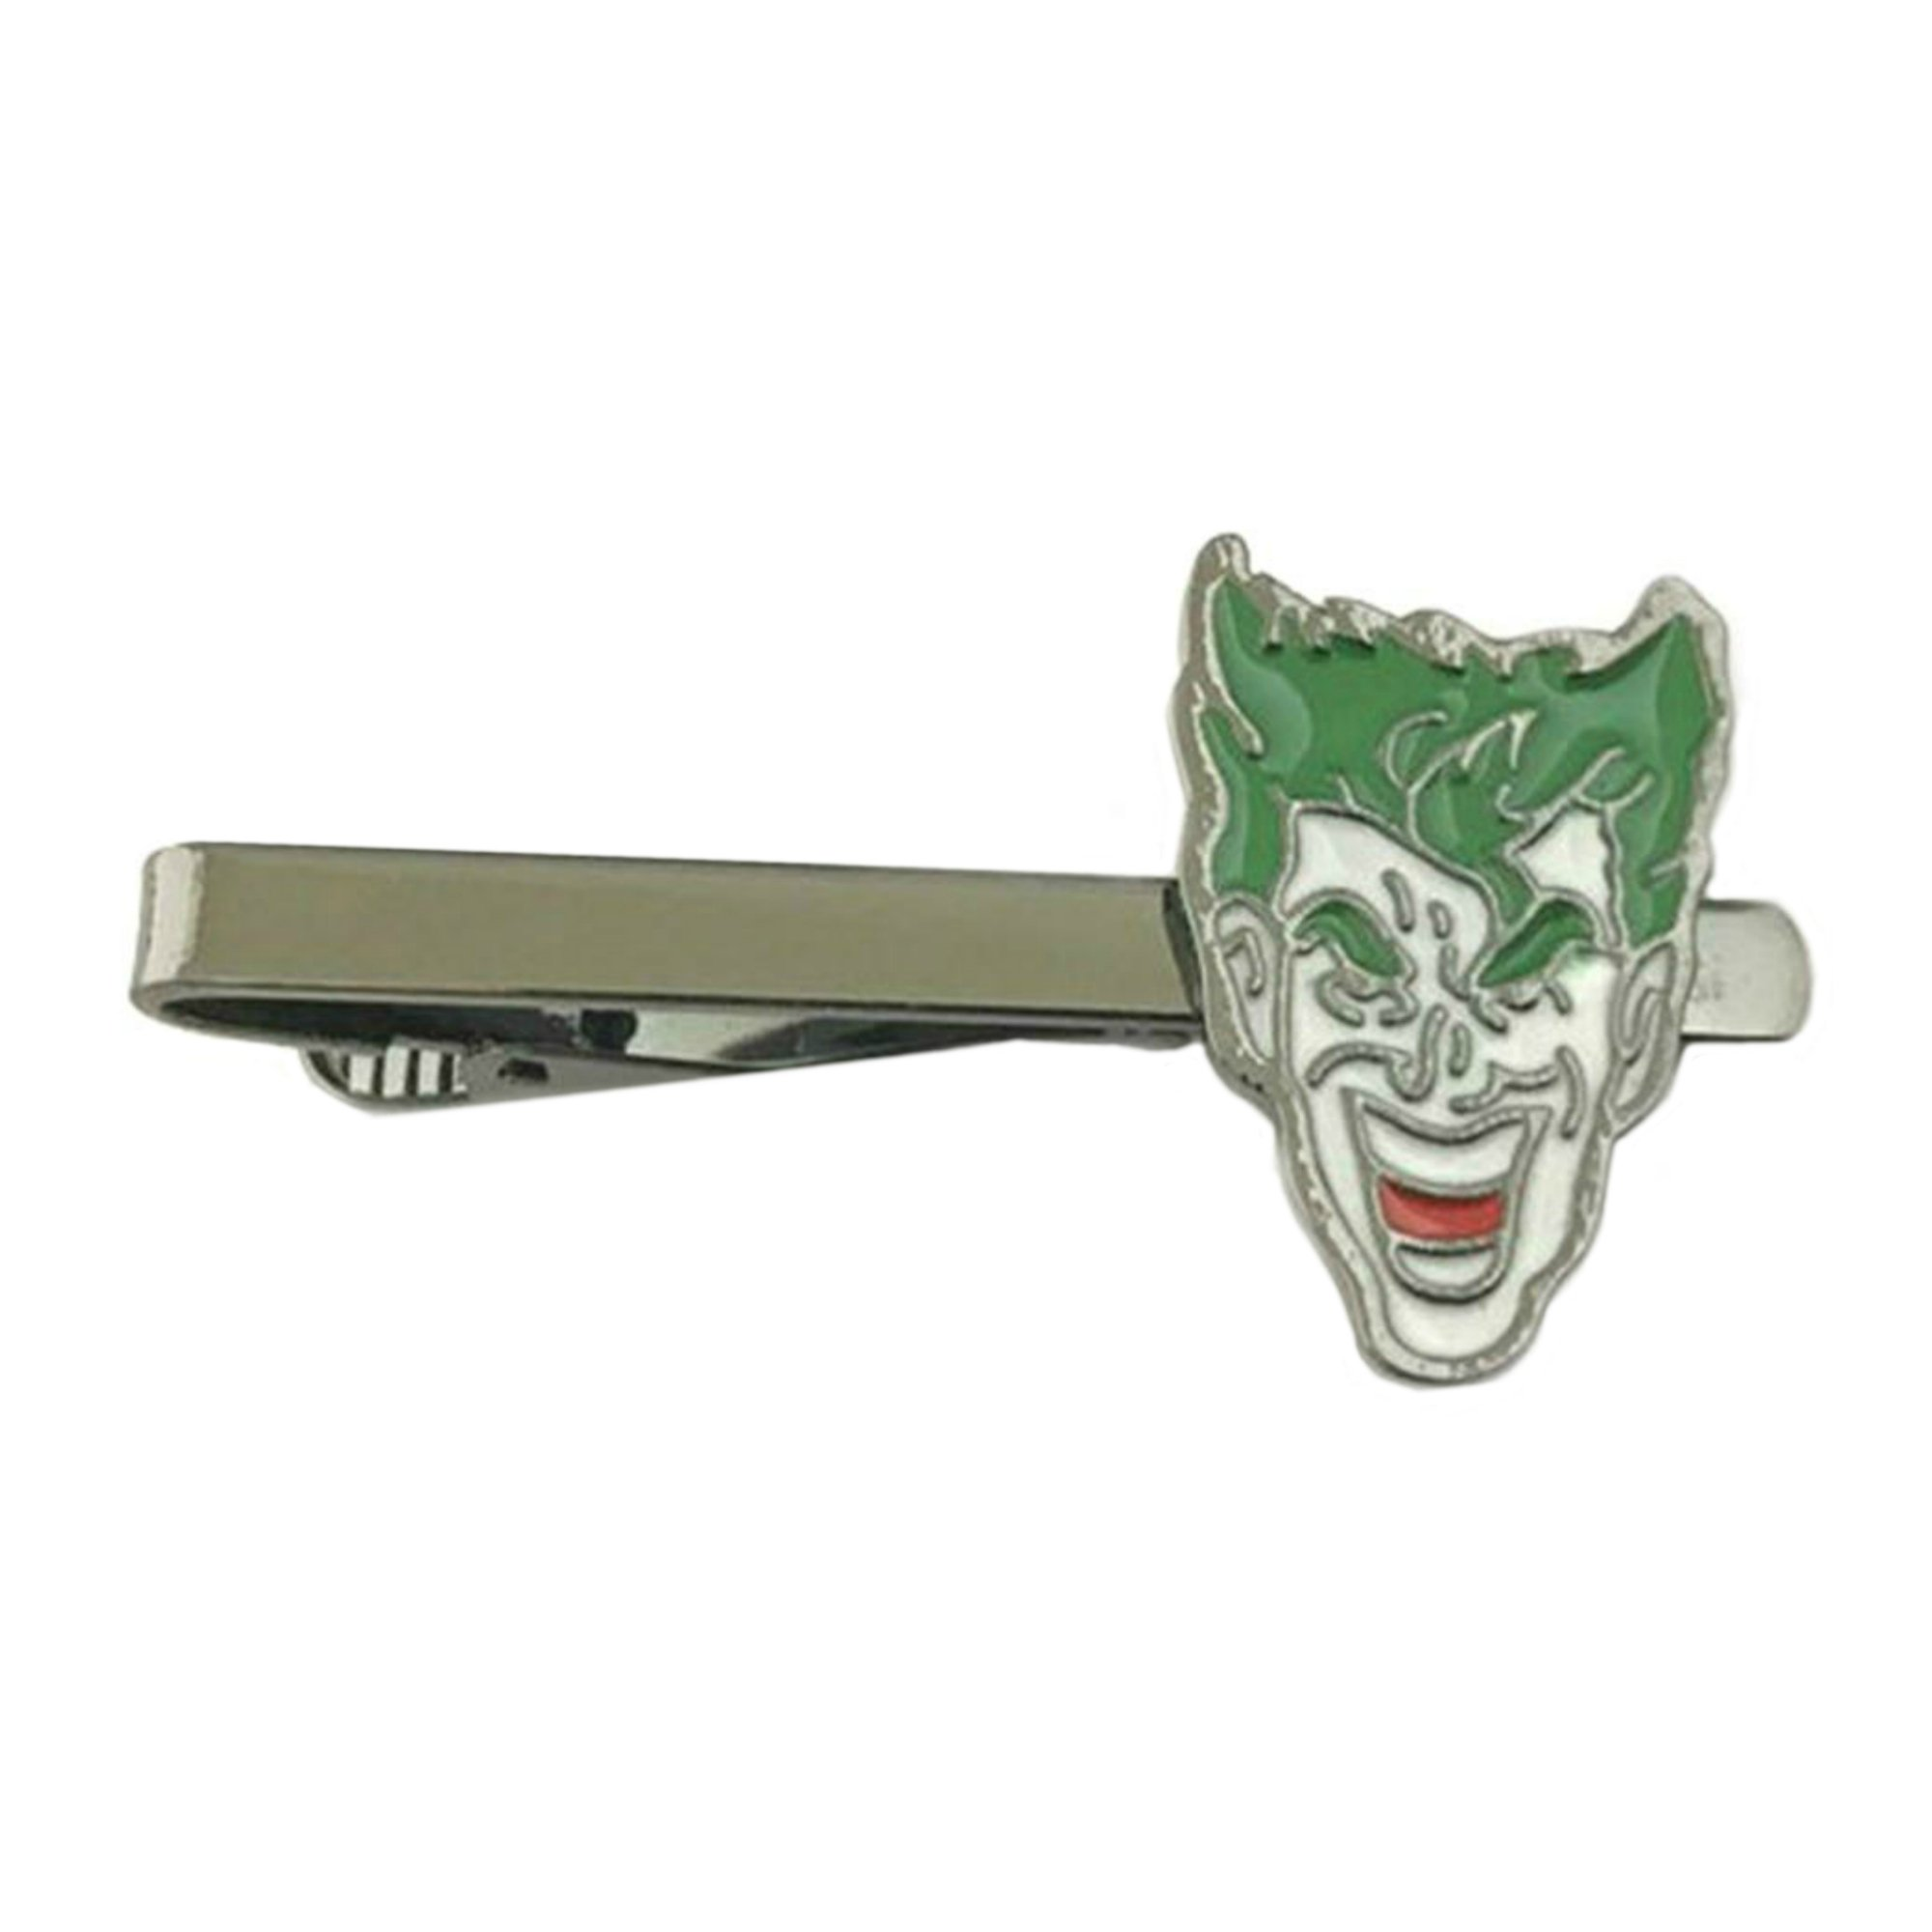 Outlander DC Comics - Joker - Tiebar Tie Clasp Wedding Superhero Logo w/Gift Box